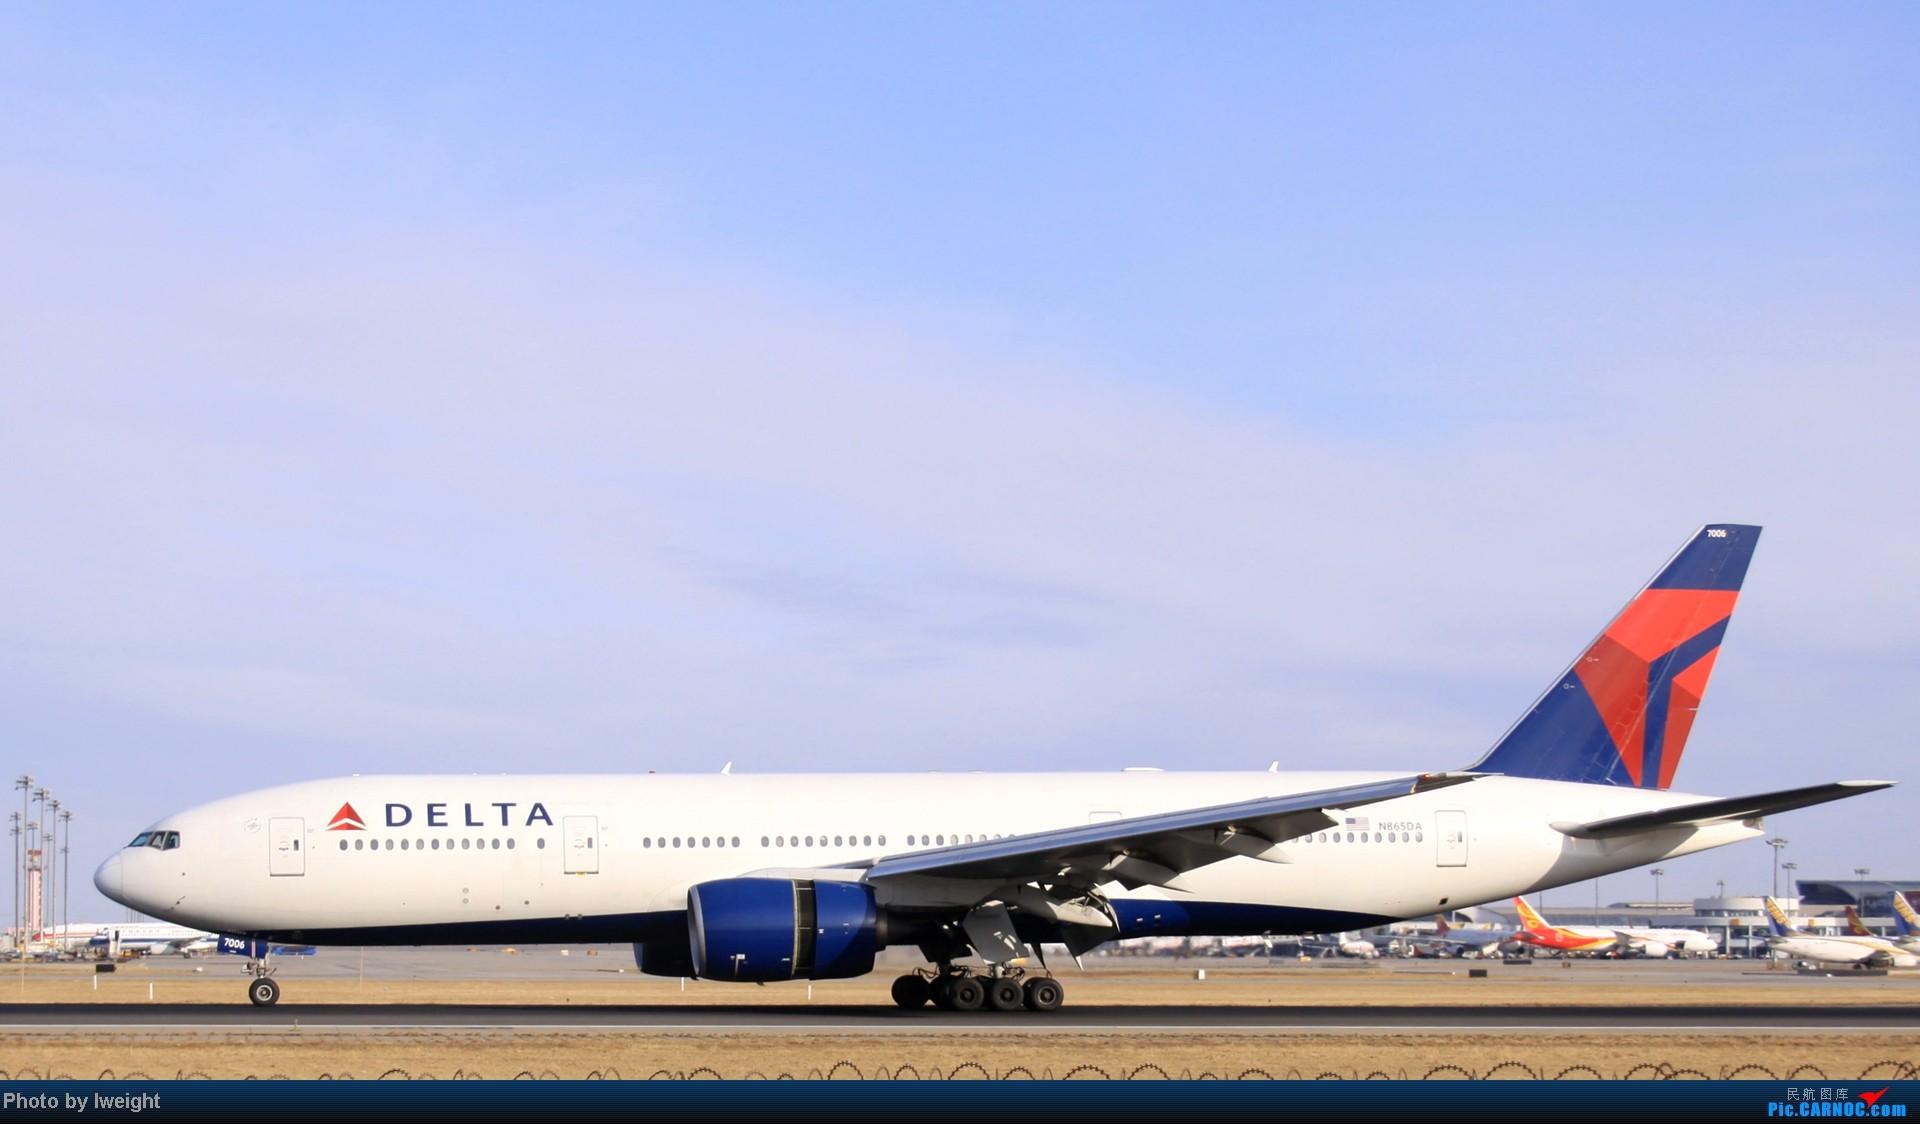 Re:[原创]今天下午瞎拍两个小时的杂图 BOEING 777-200 N865DA 中国北京首都机场